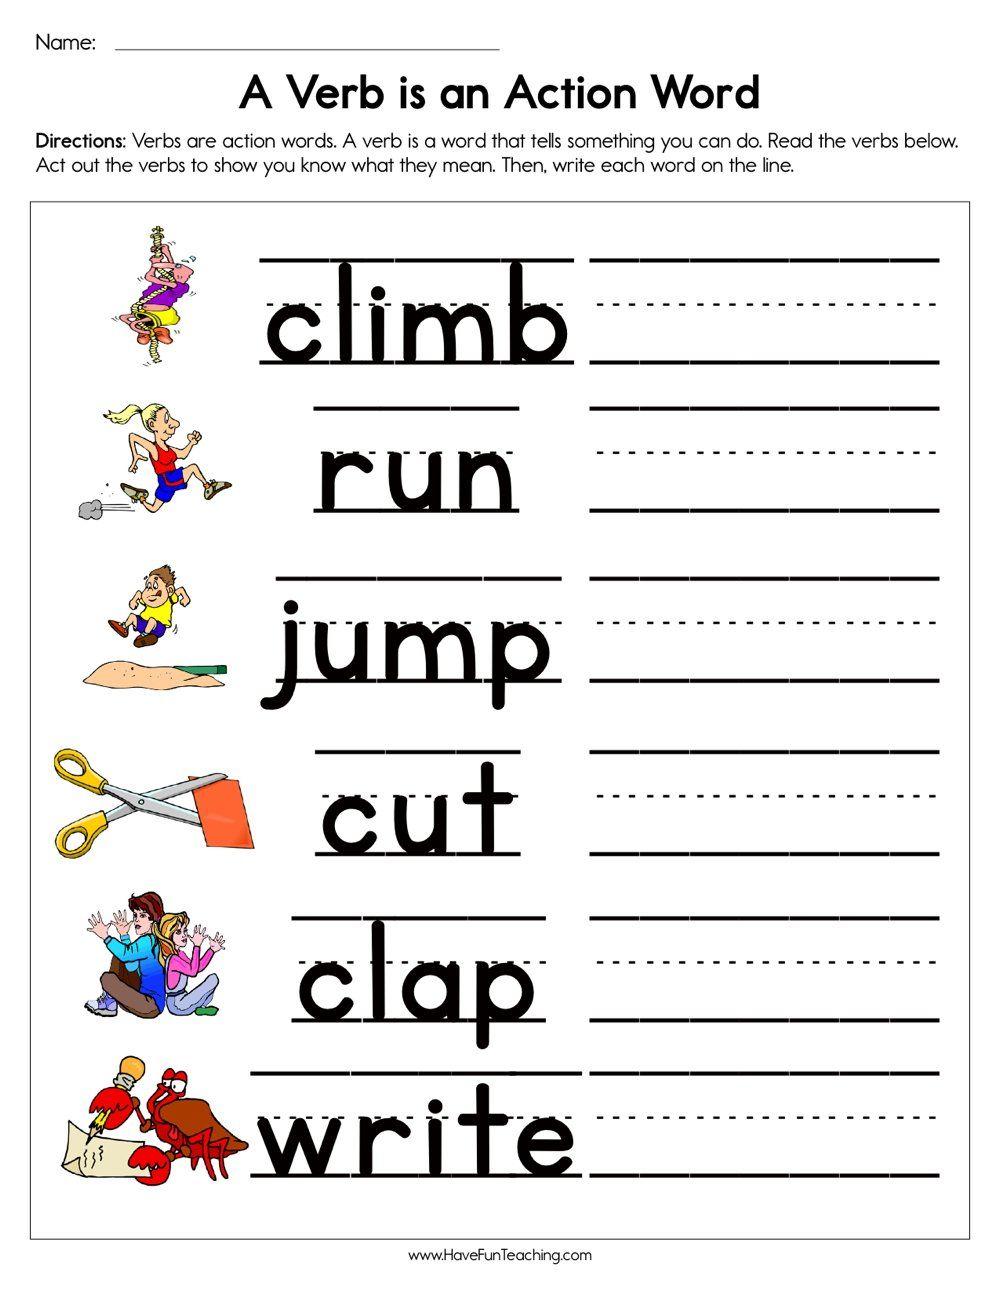 medium resolution of A Verb is an Action Word Worksheet   Action verbs worksheet